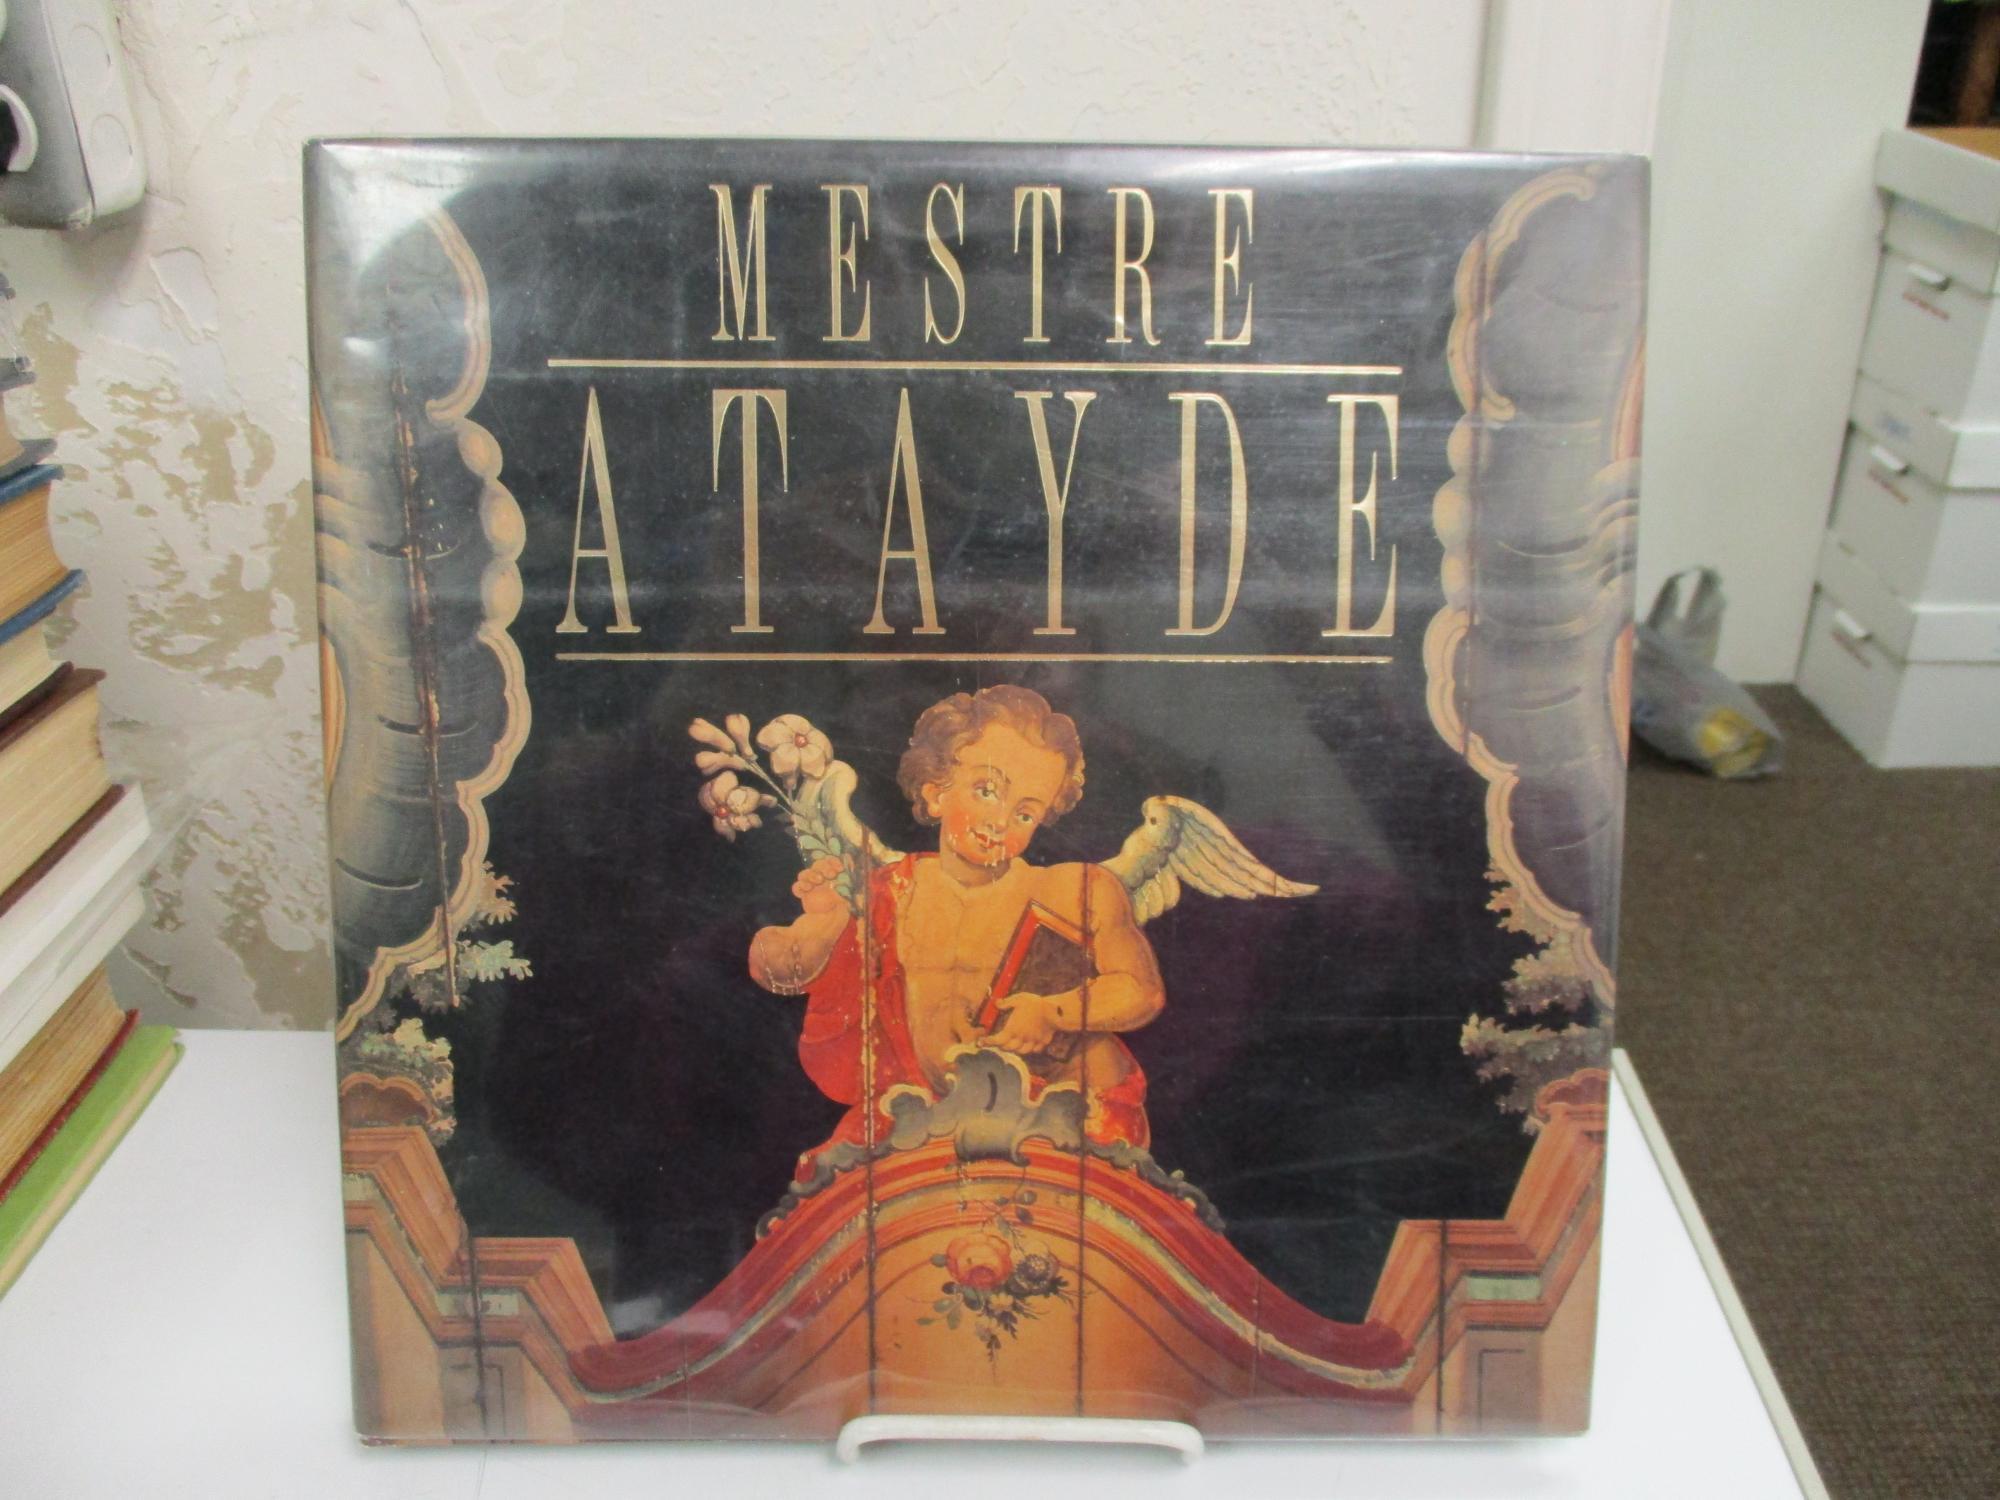 Mestre Atayde Ogenio Da Pintura Mineira the Genius of Painting in Minas Gerais. - de Menezes, Ivo Porto.